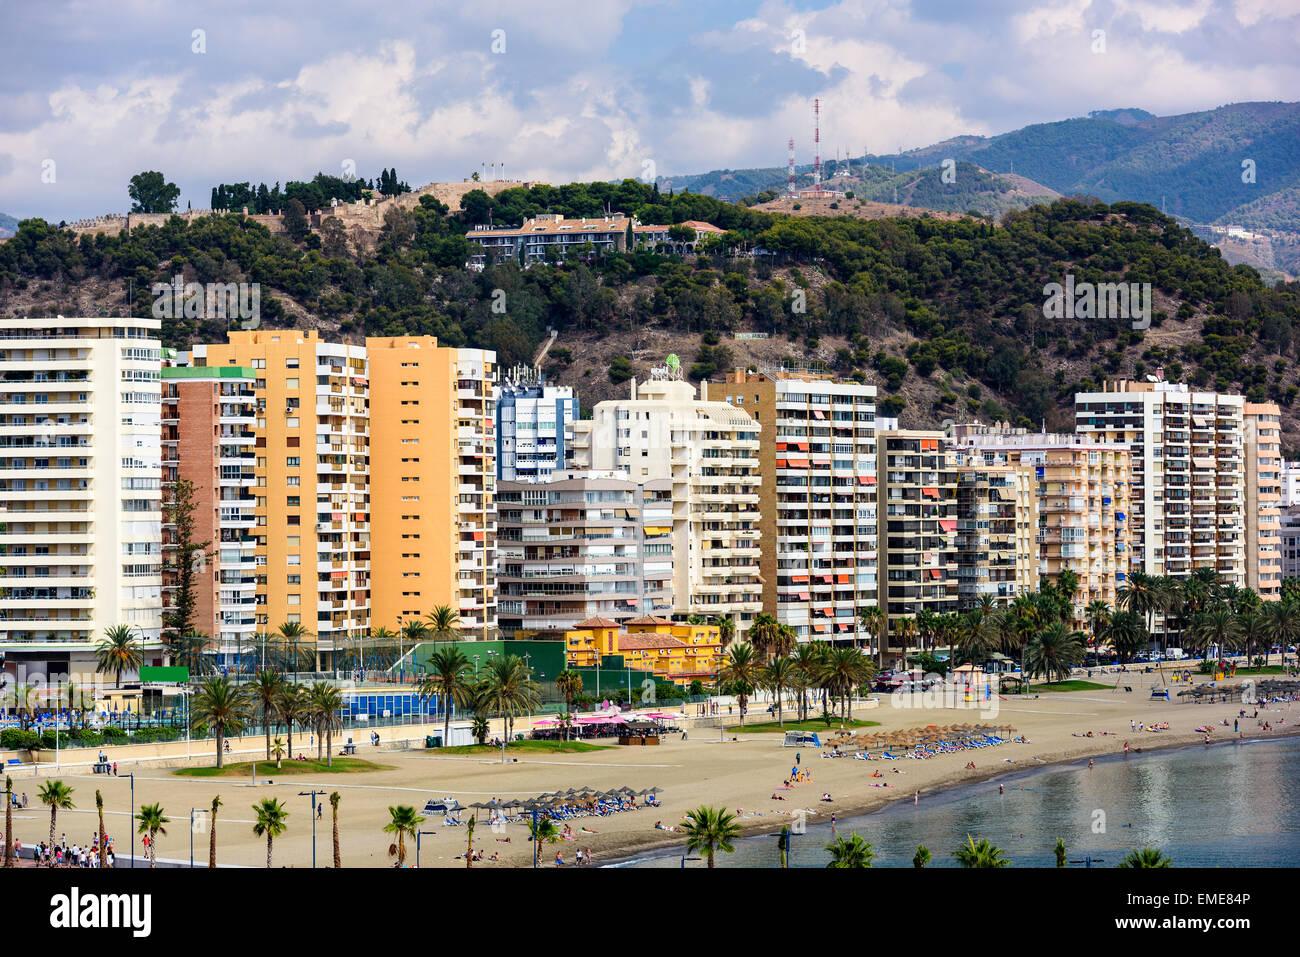 Malaga, Espagne resort skyline à la plage de Malagueta. Photo Stock